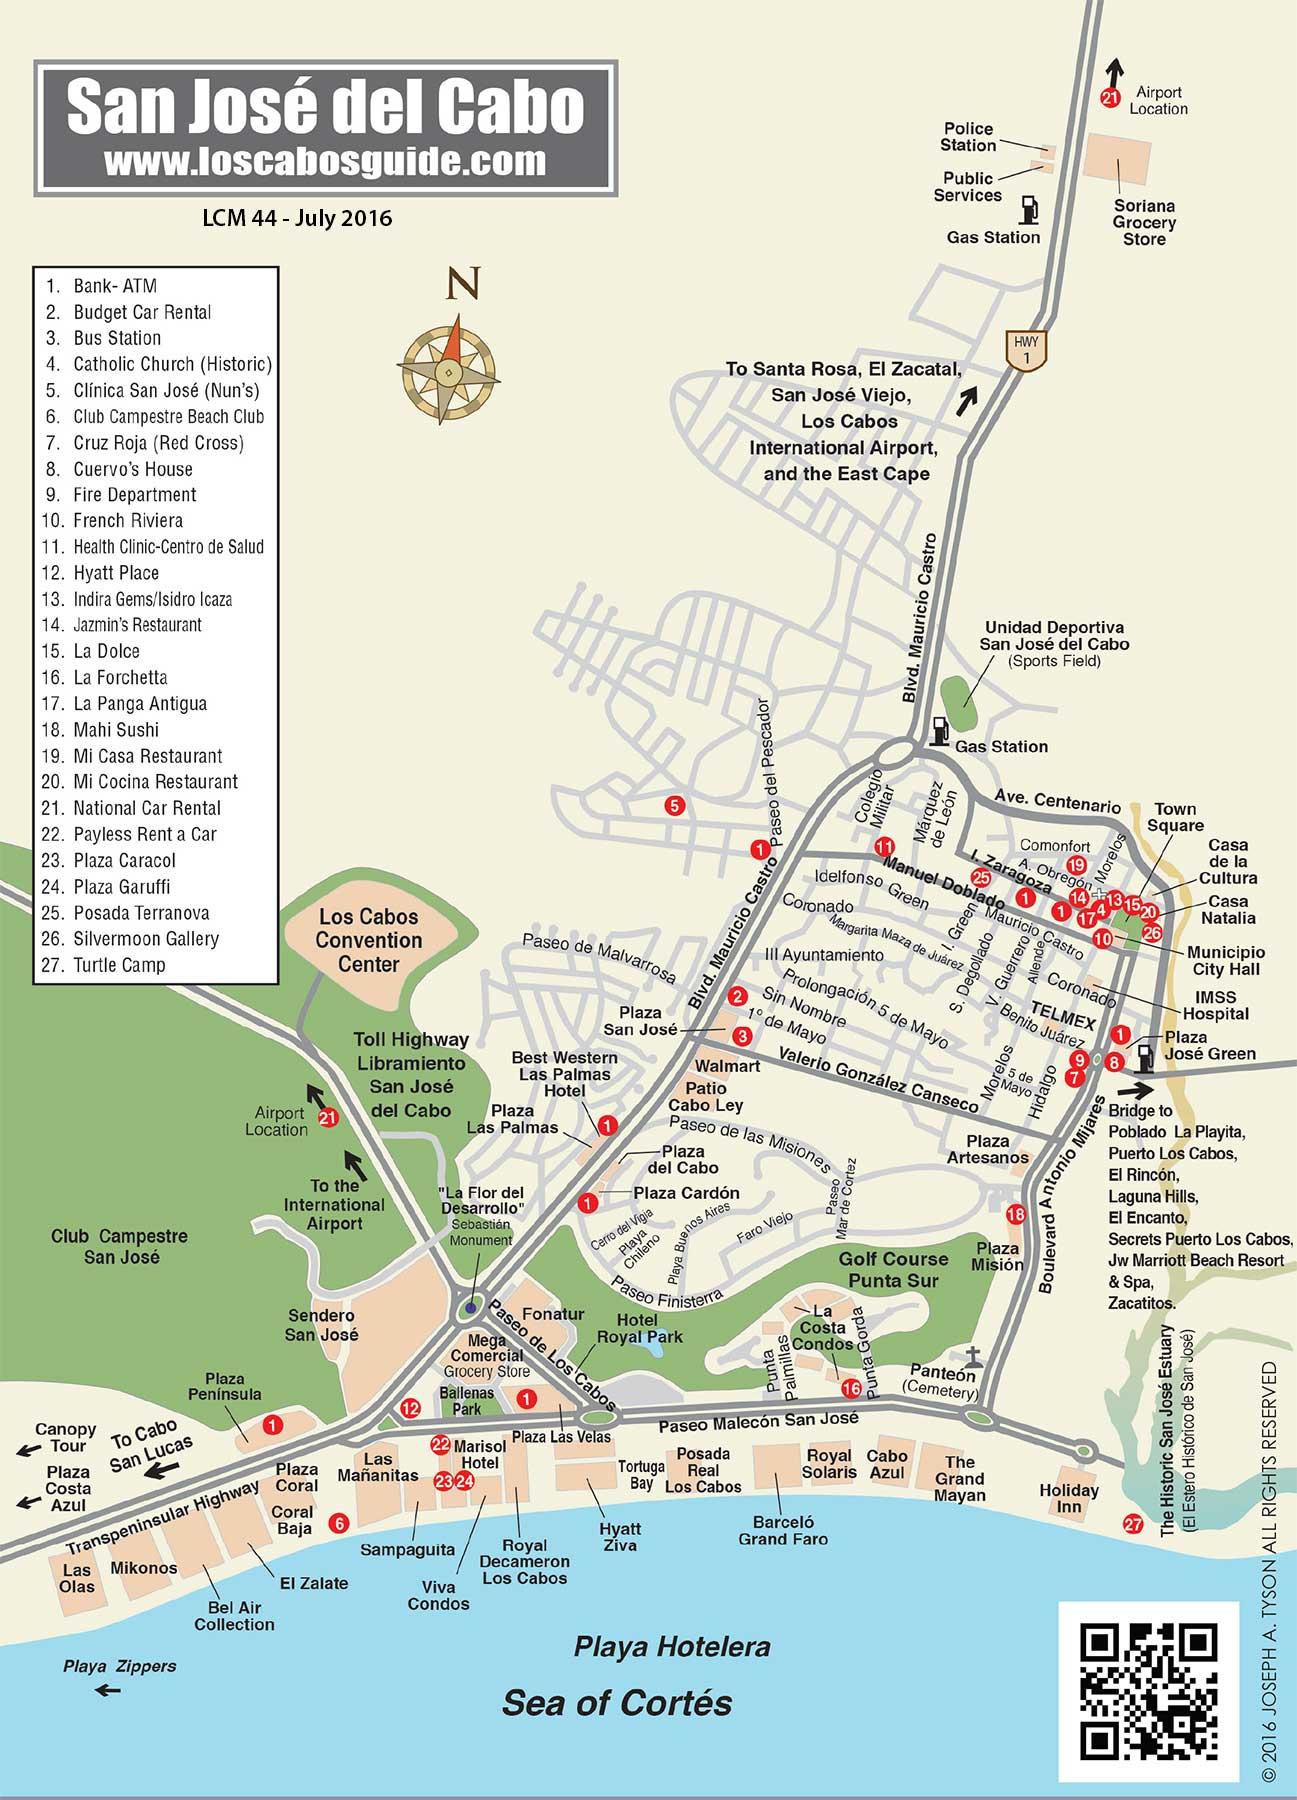 San Jose Tourist Map Lisbon Maps Top Tourist Attractions Free - Printable Map Of San Jose